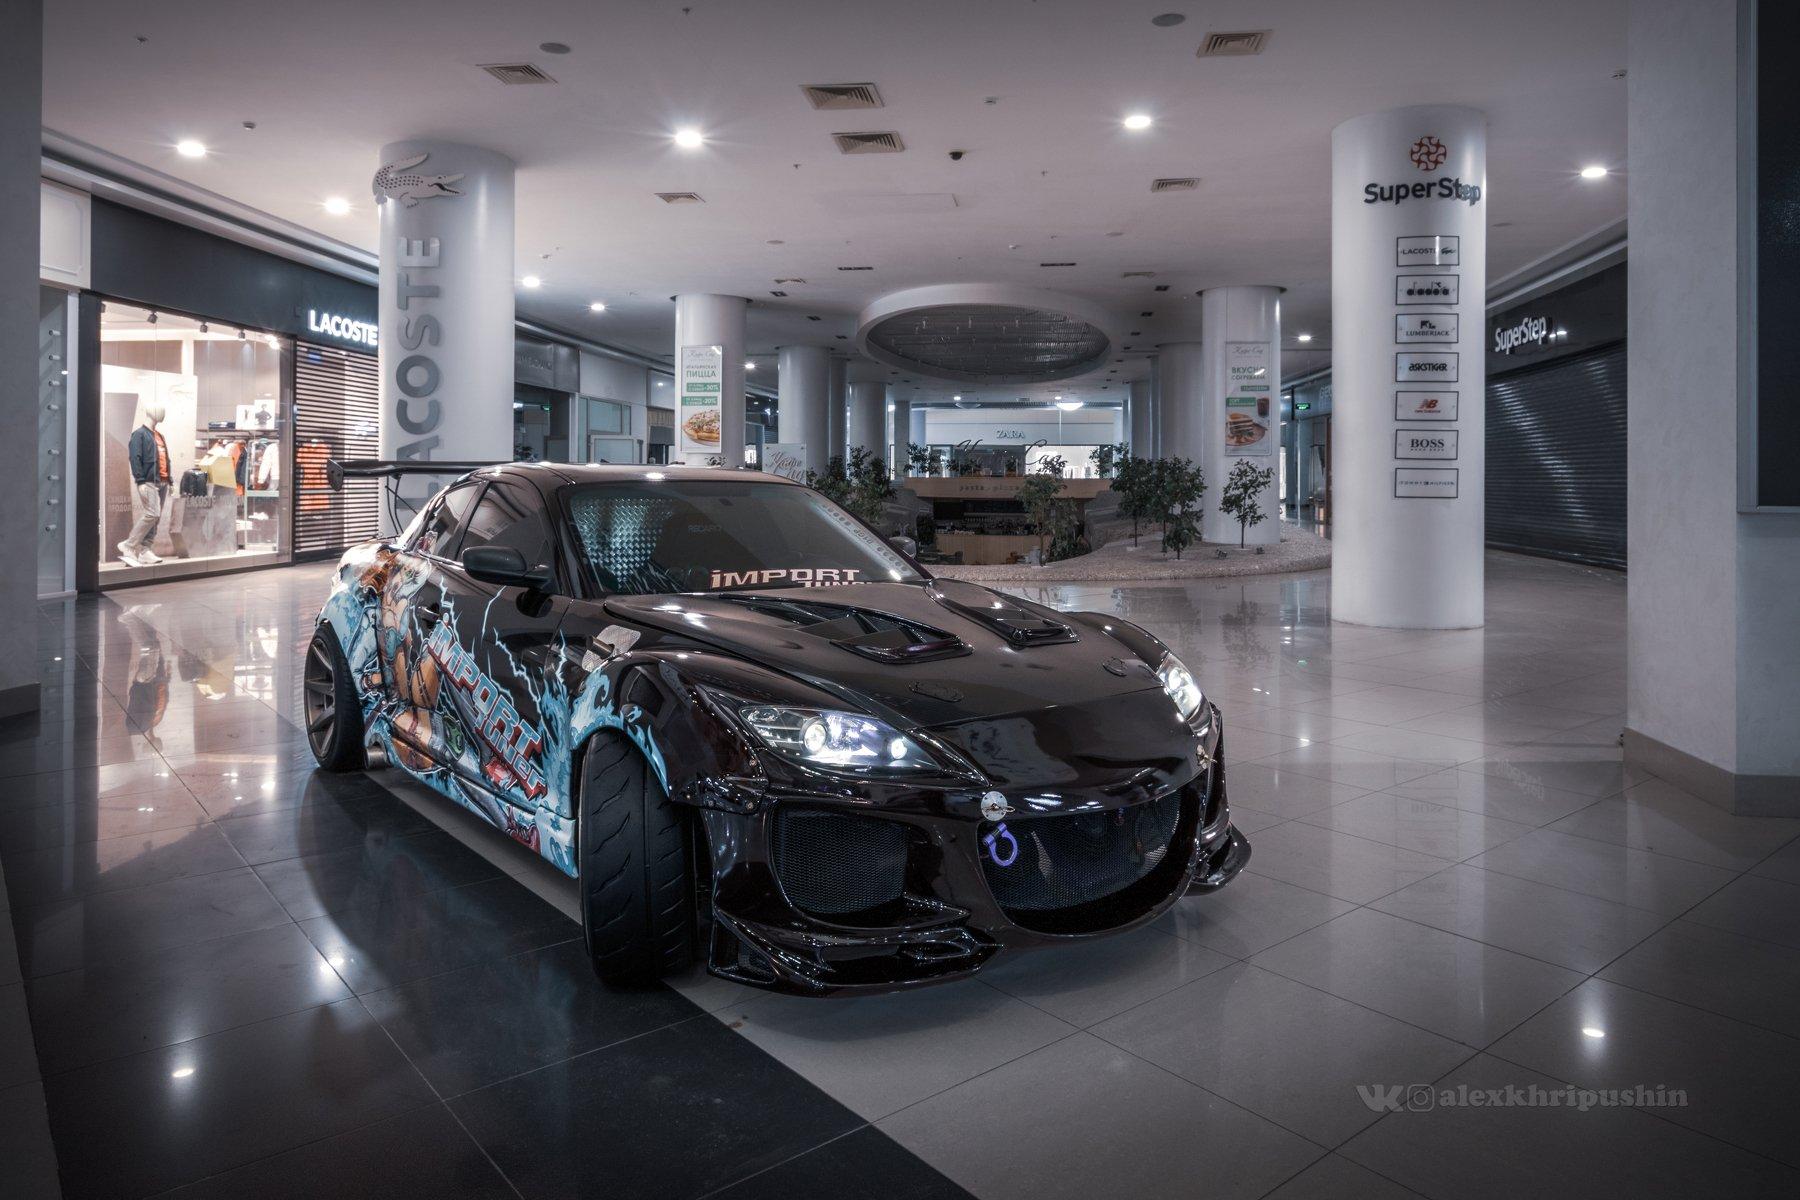 car, automotive, interior, exhibition, Хрипушин Александр